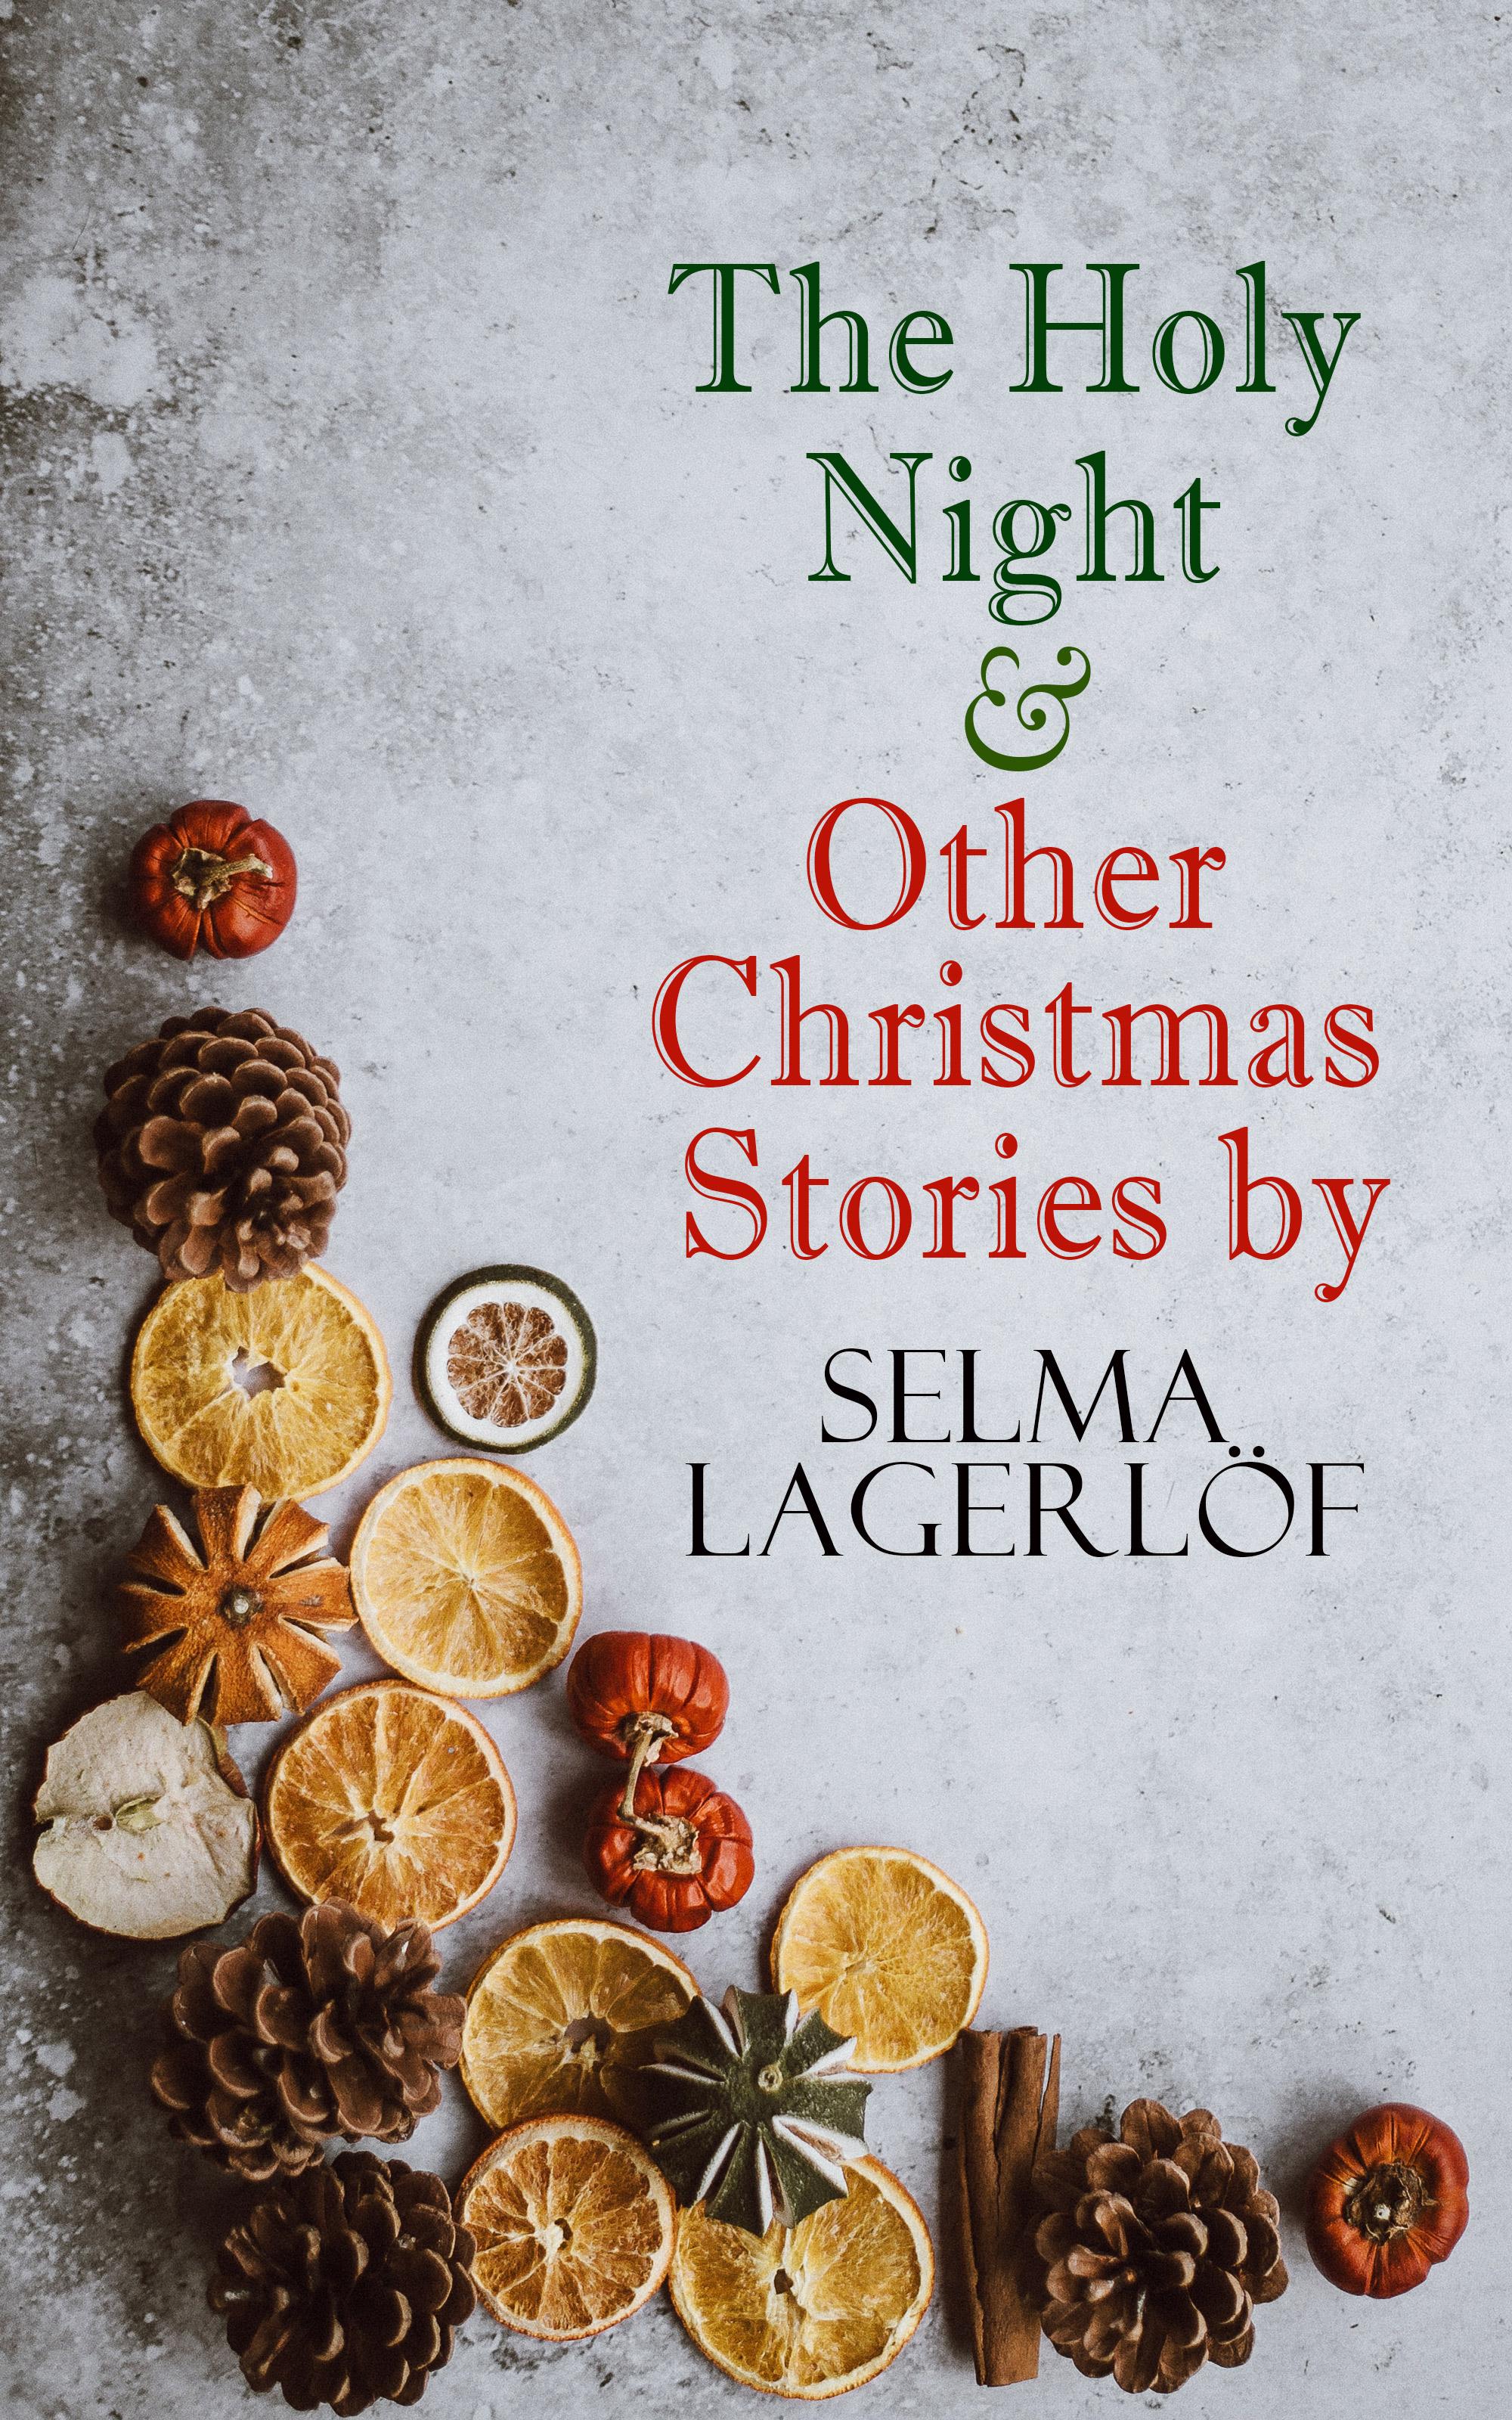 цена Selma Lagerlof The Holy Night & Other Christmas Stories by Selma Lagerlöf онлайн в 2017 году